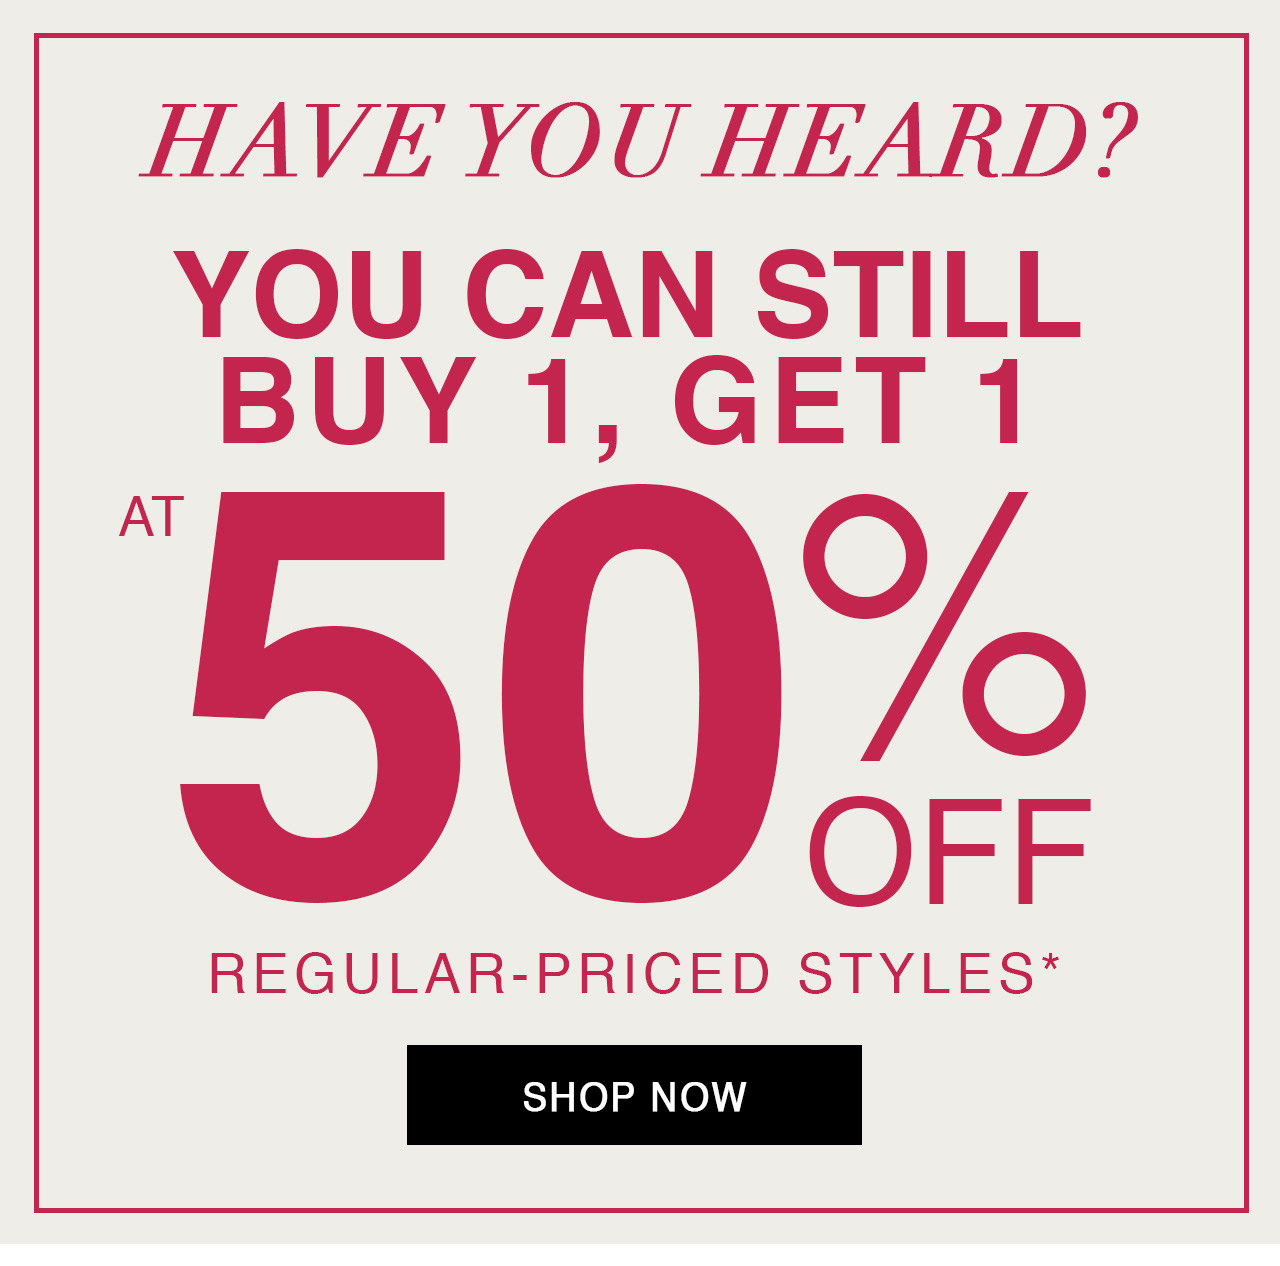 Buy 1, get 1 at 50% off regular-priced merchandise*